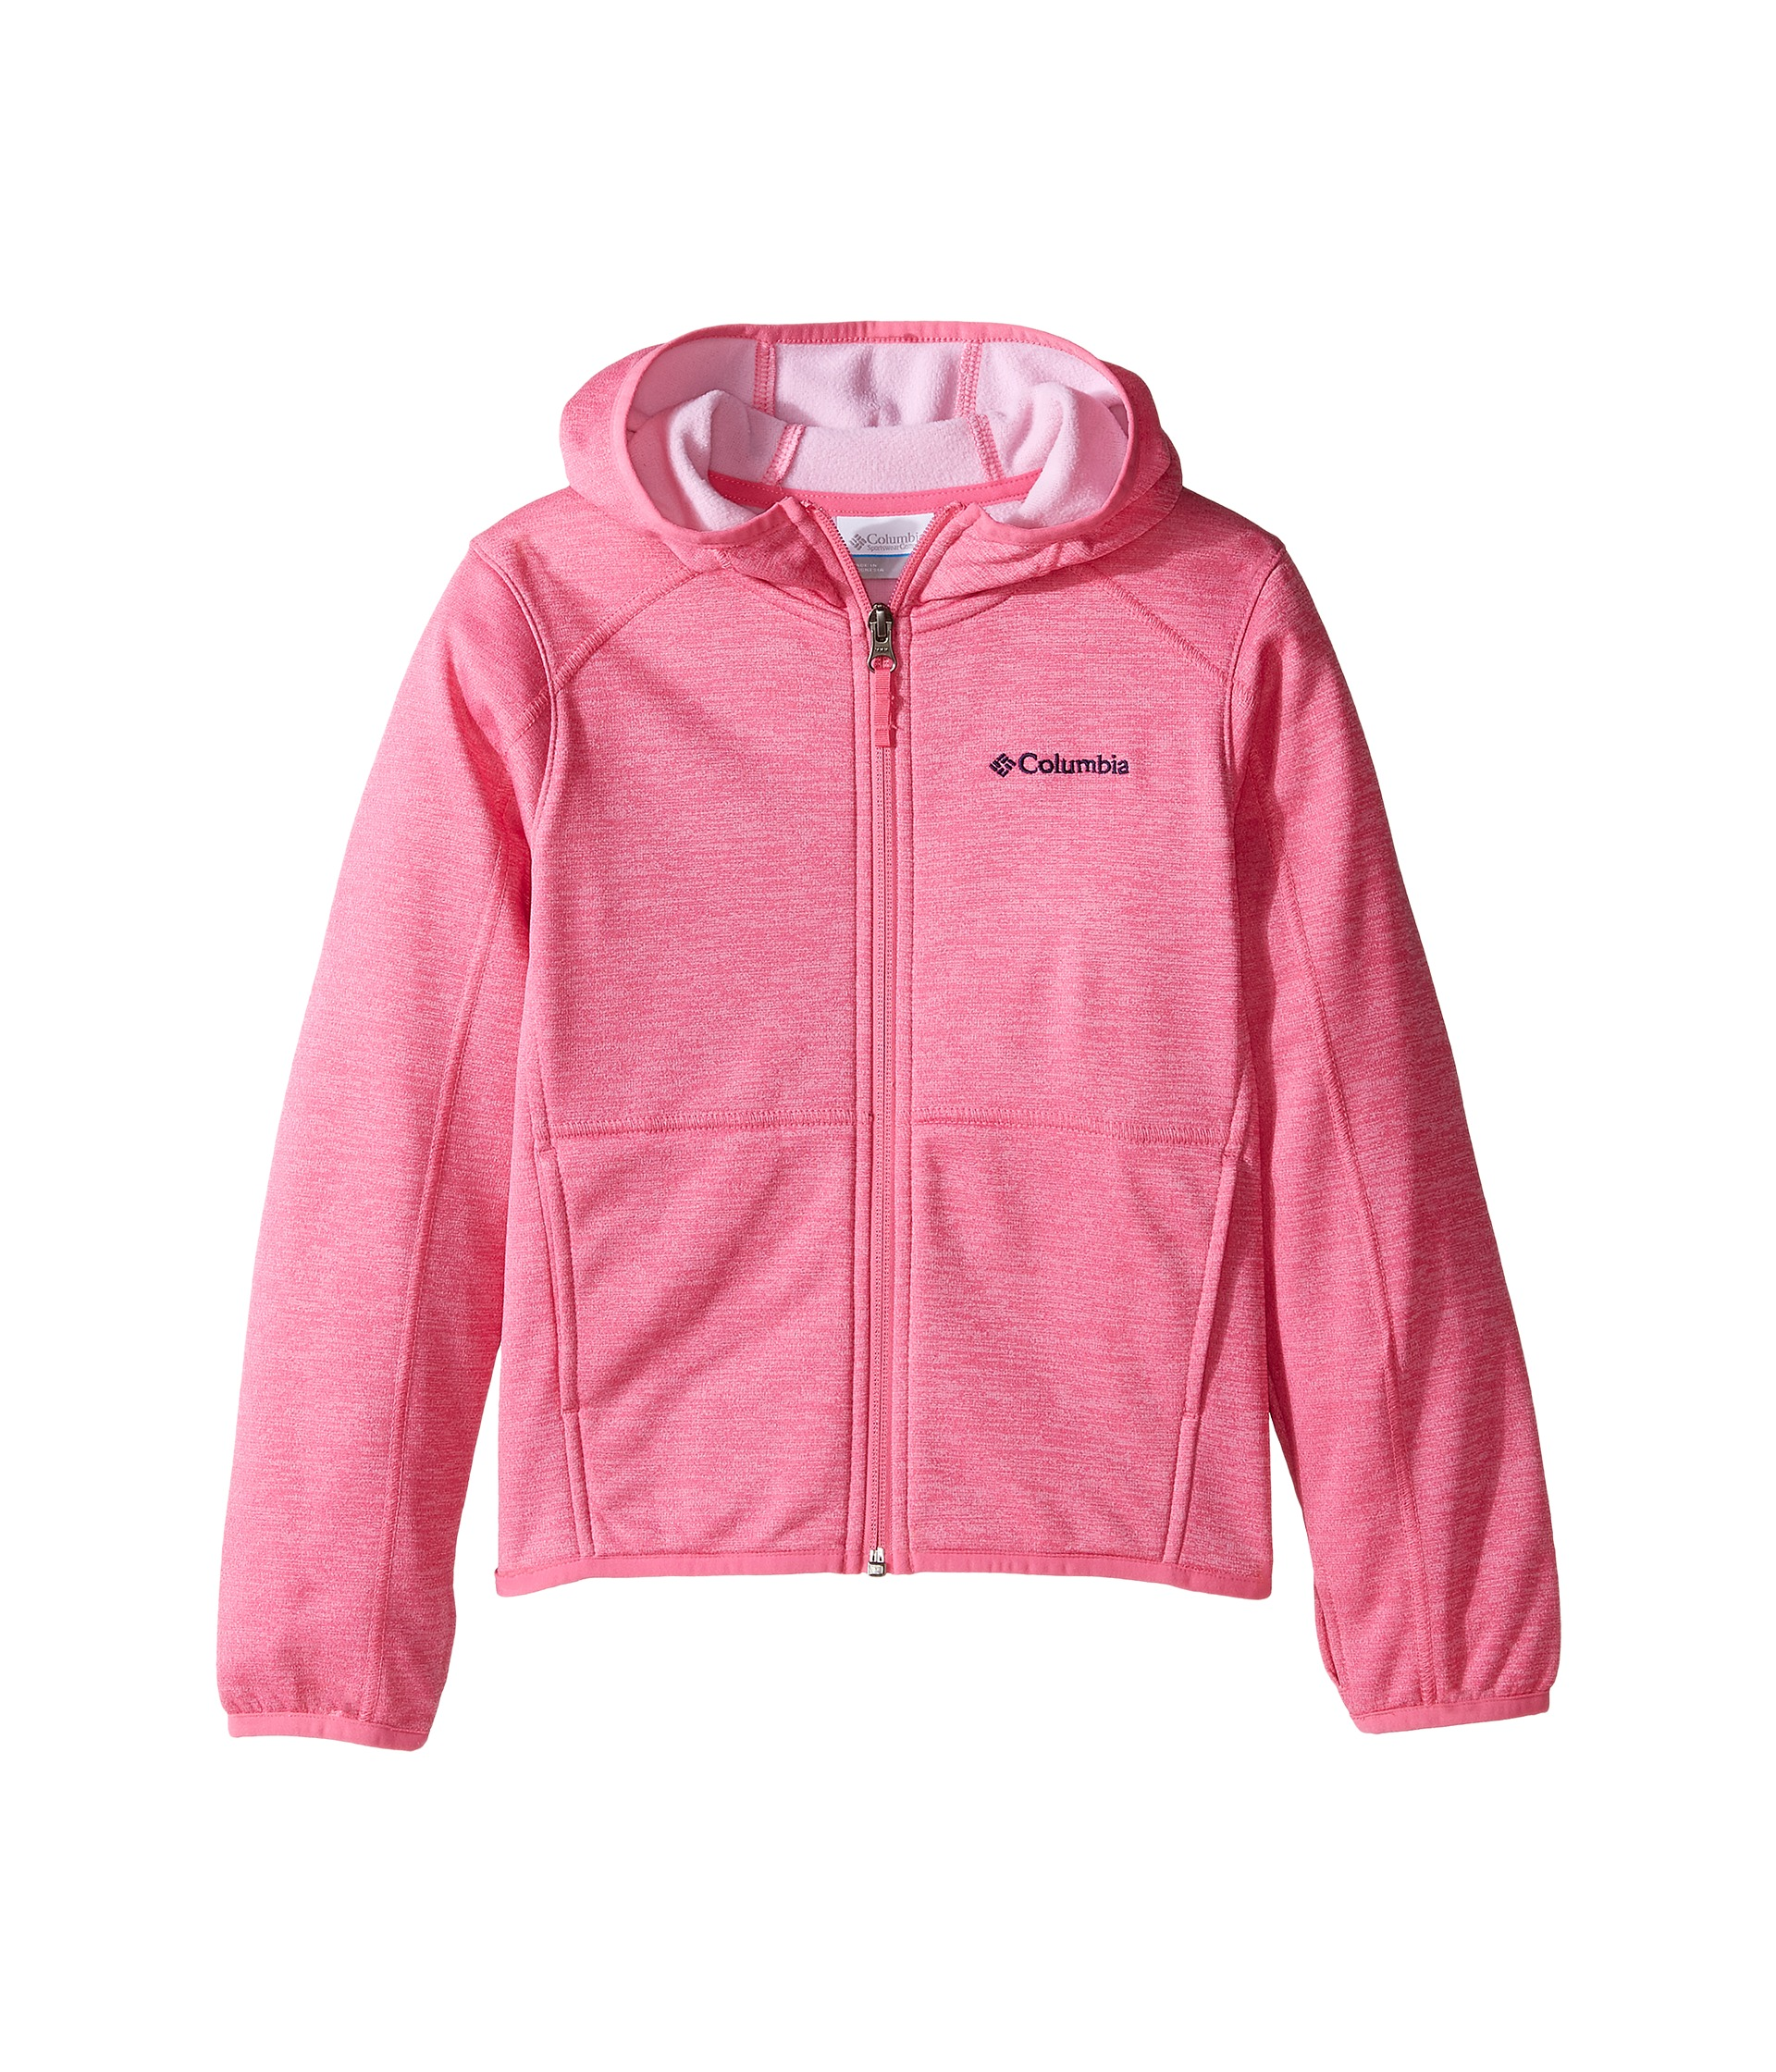 Columbia zip up hoodie